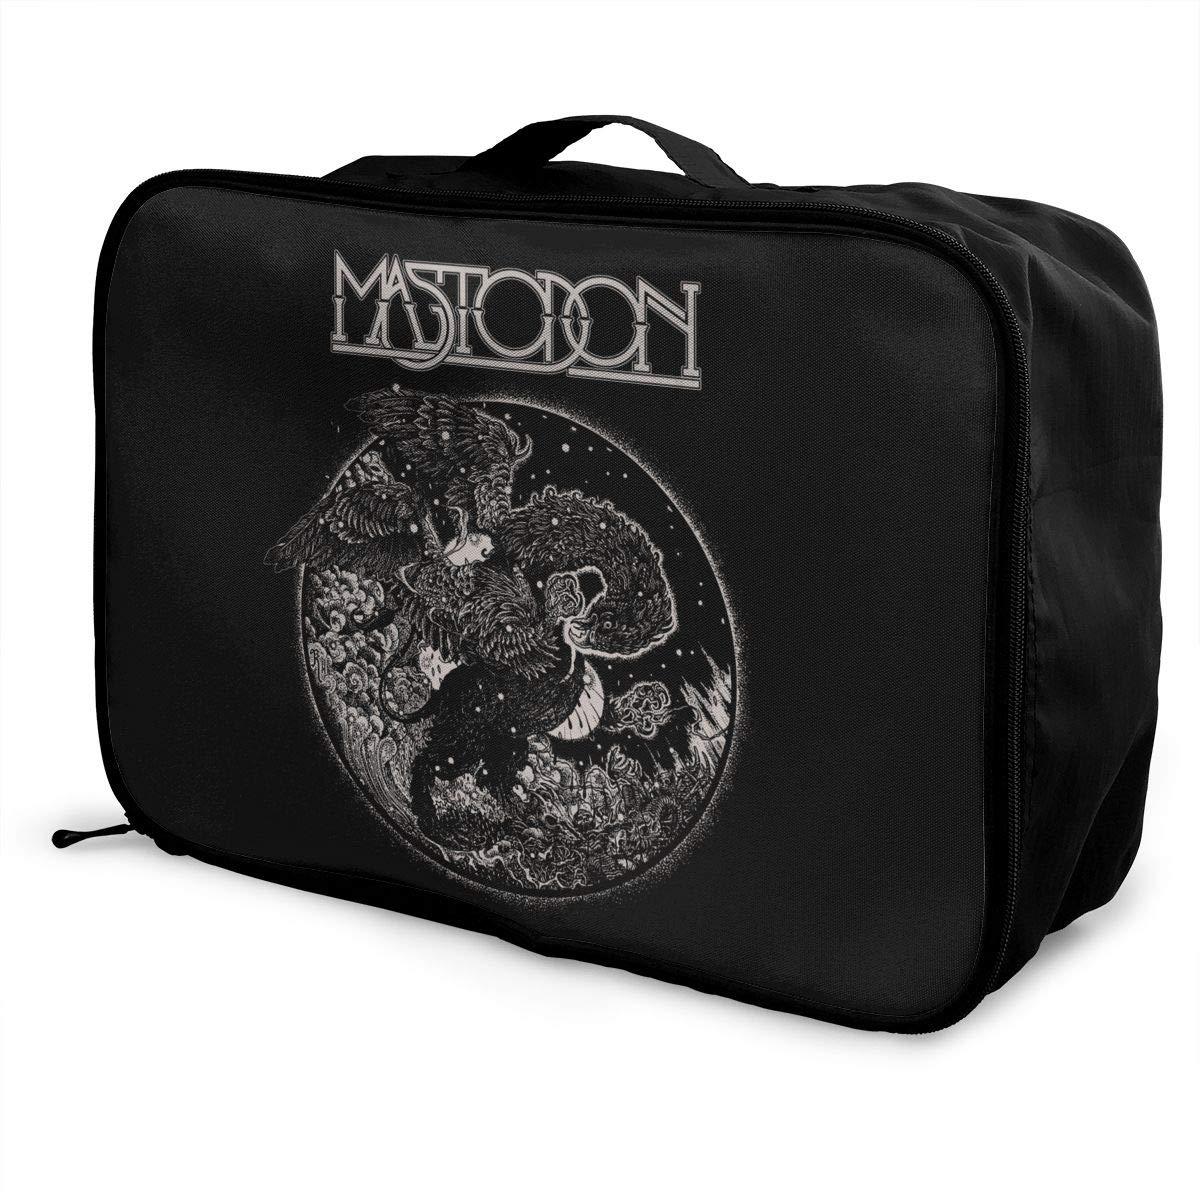 Fretlo Mastodon Travel Duffel Bag Waterproof Lightweight Large Capacity Portable Luggage Bag Black